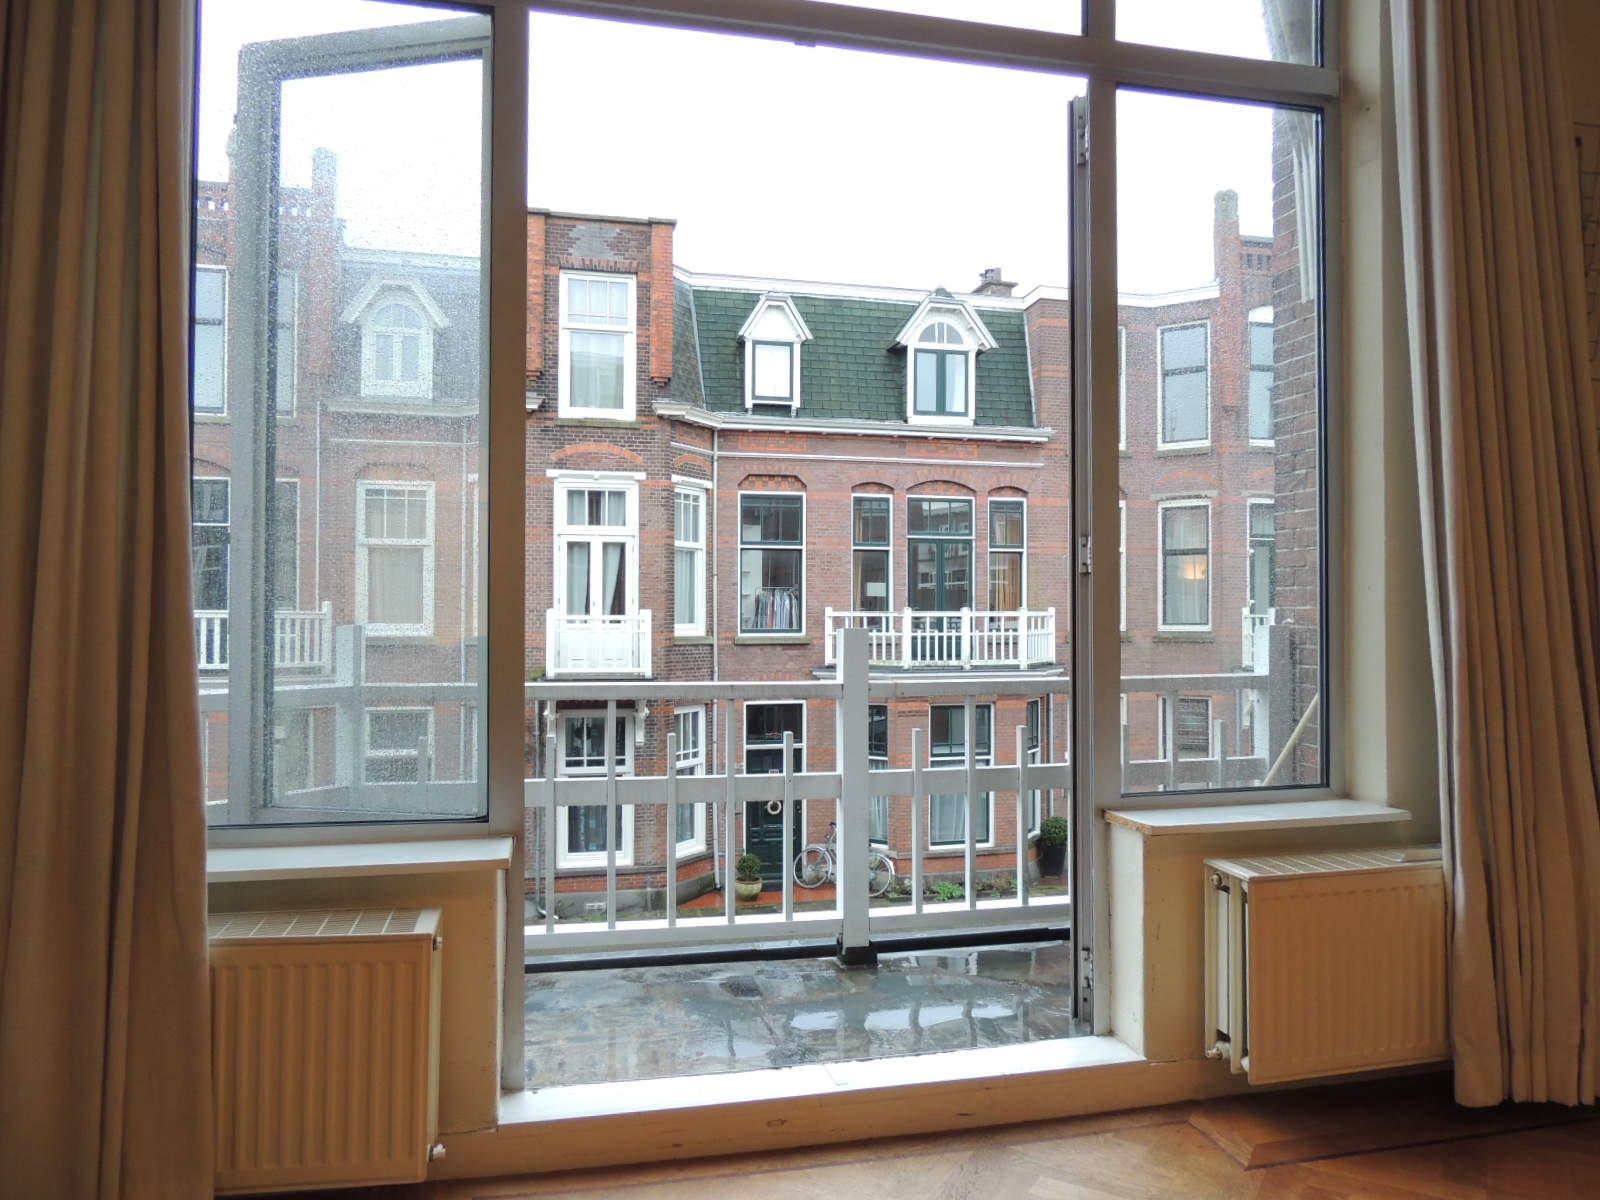 Nicolaistraat, The Hague